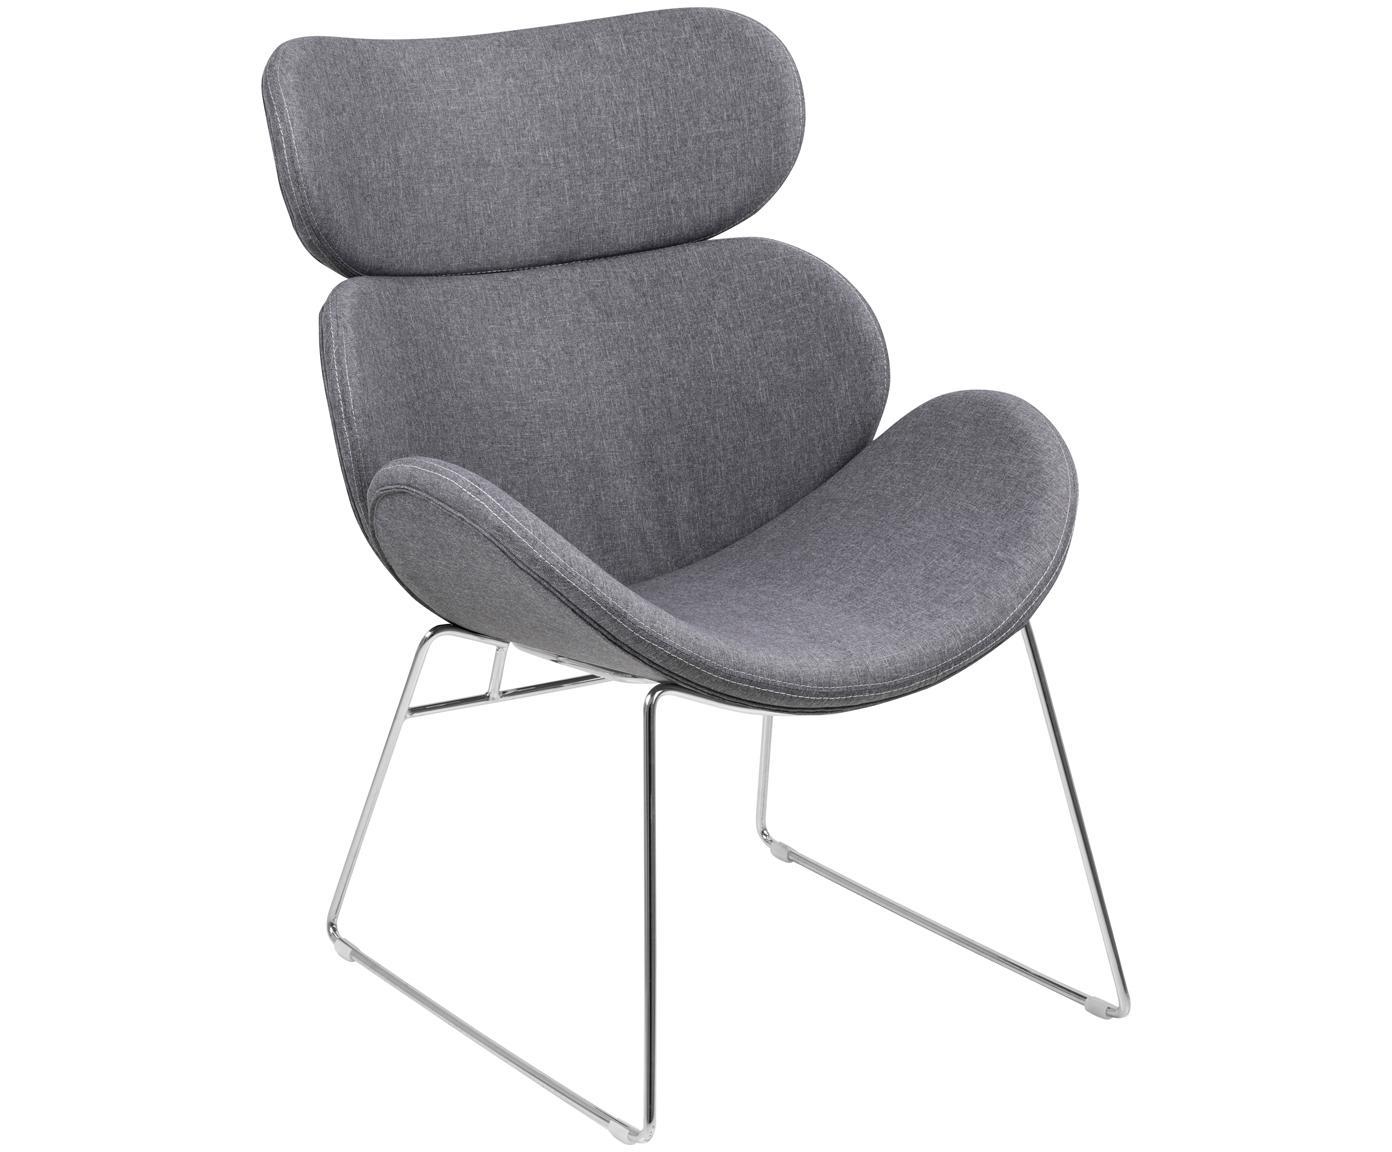 Moderne loungefauteuil Cazar in lichtgrijs, Bekleding: polyester, Frame: verchroomd metaal, Lichtgrijs, chroomkleurig, B 69 x D 79 cm